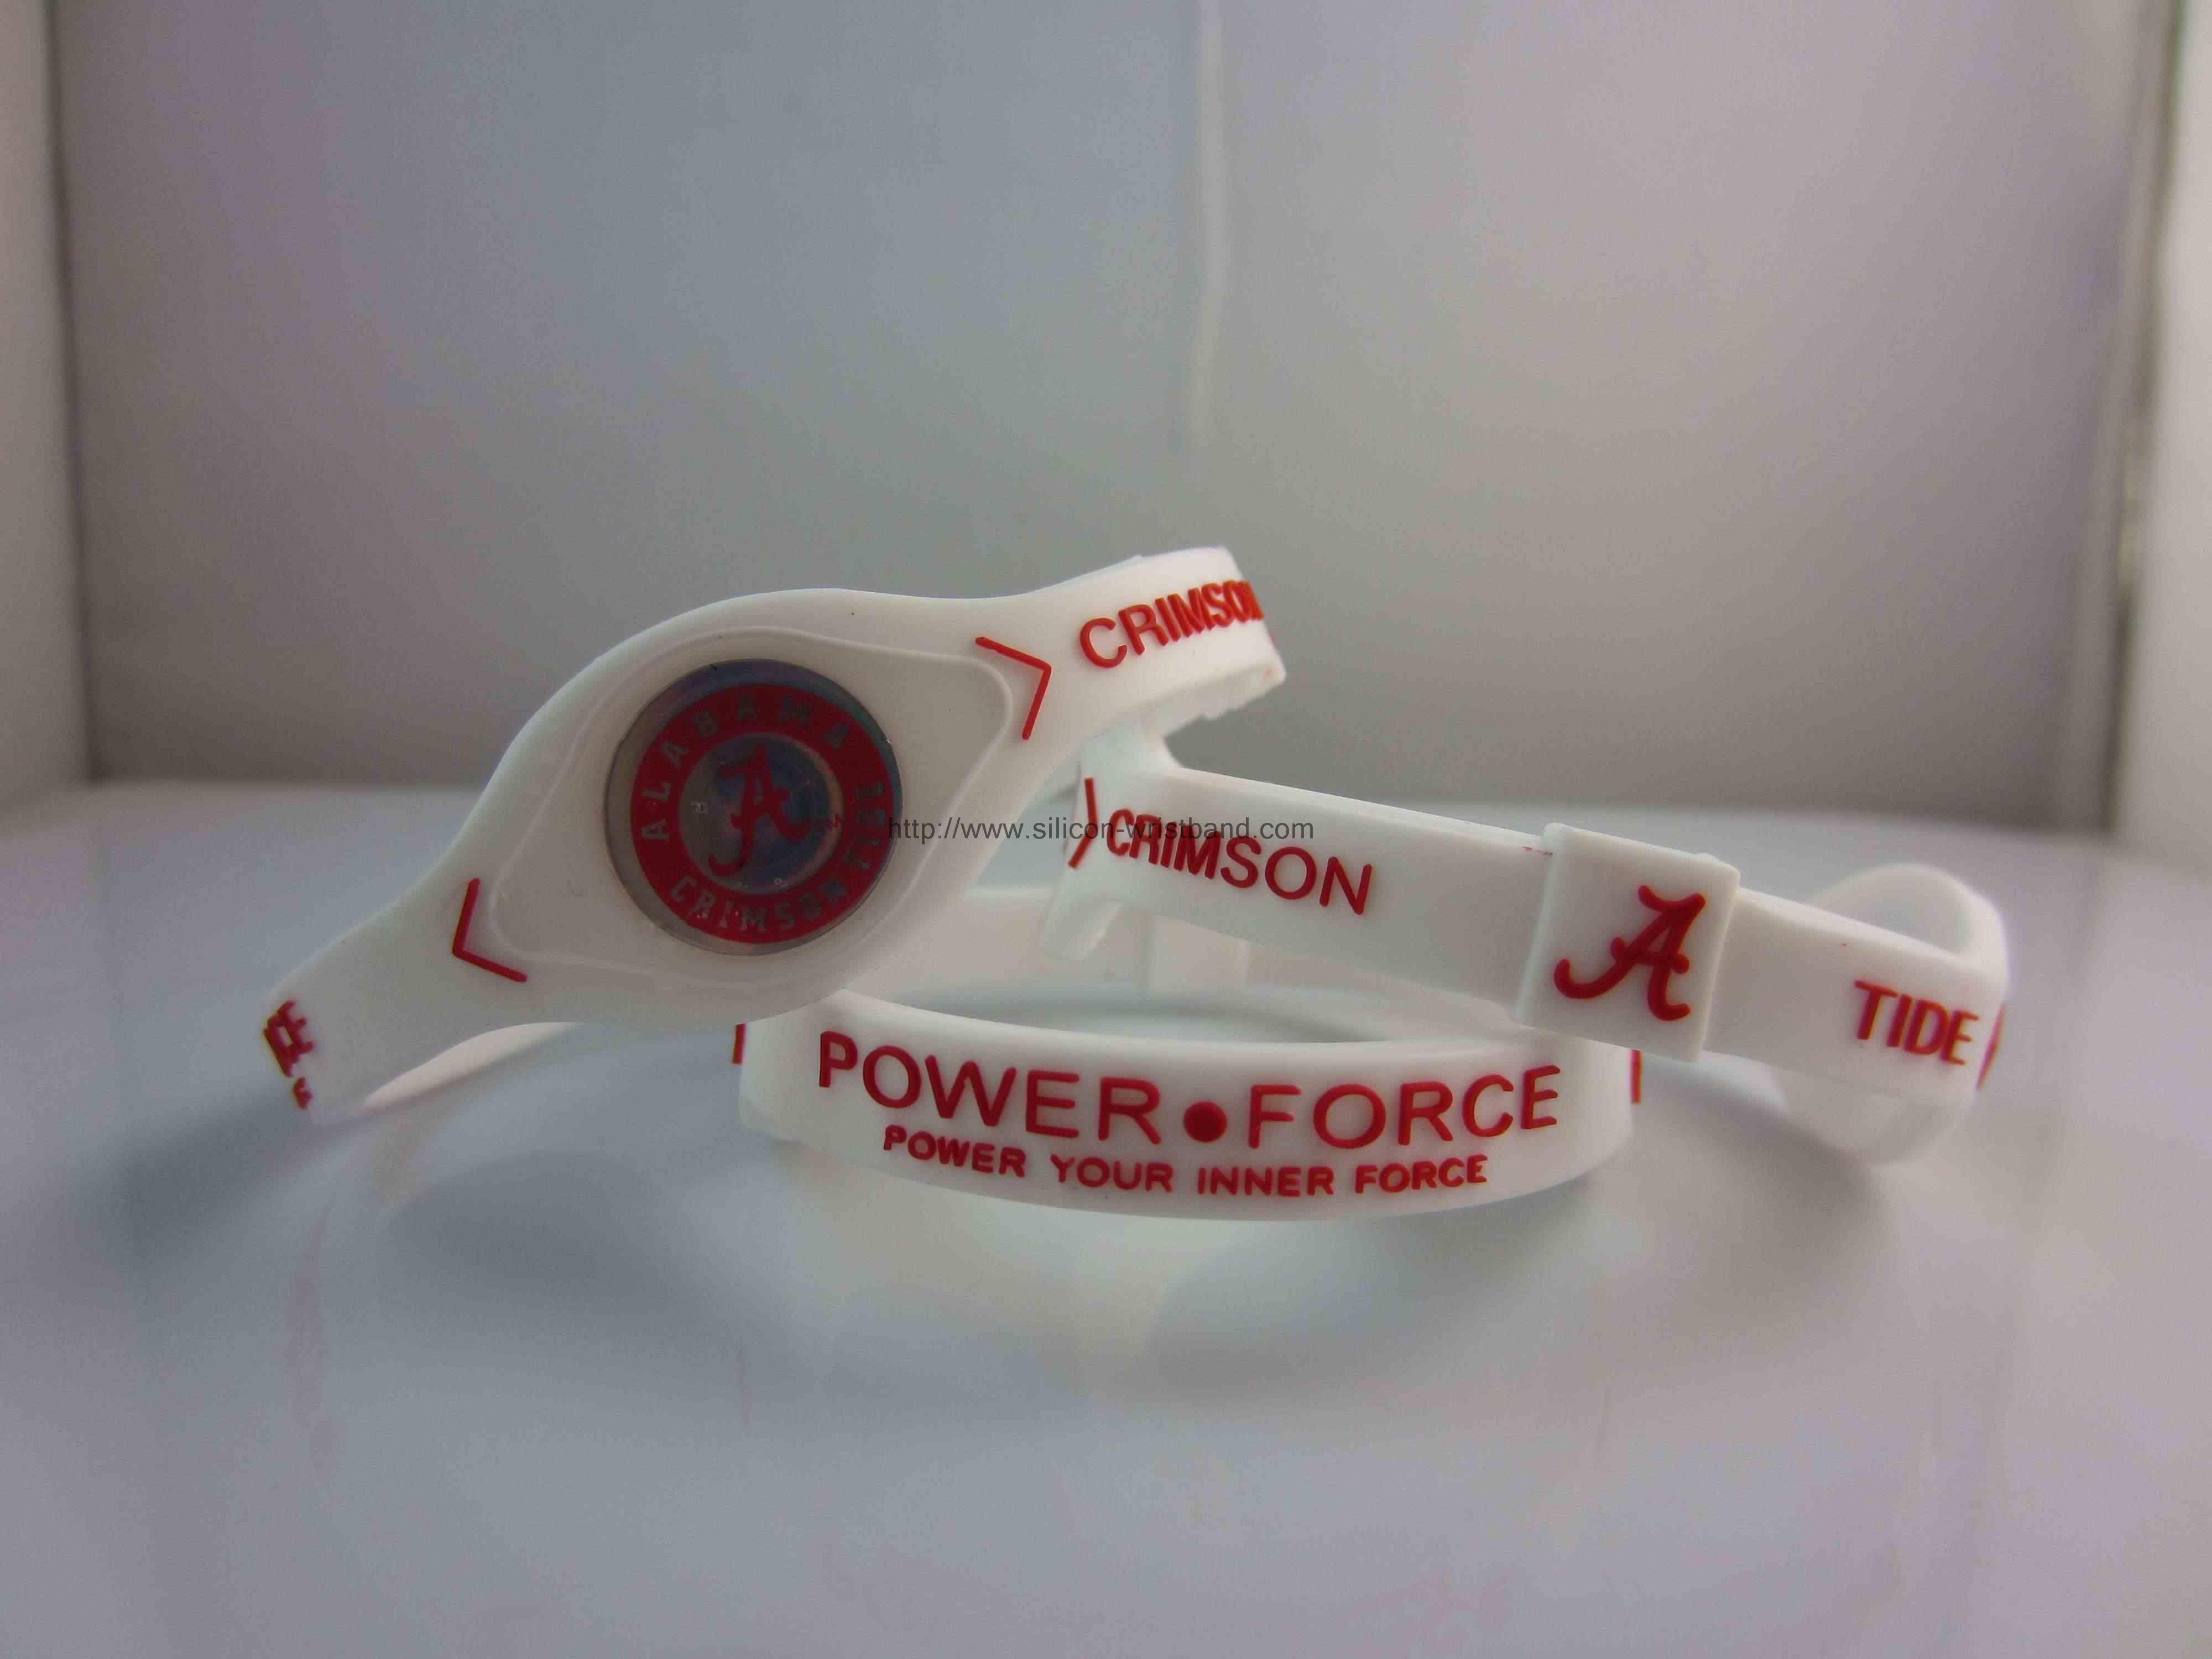 The origin of cancer silicone wristband